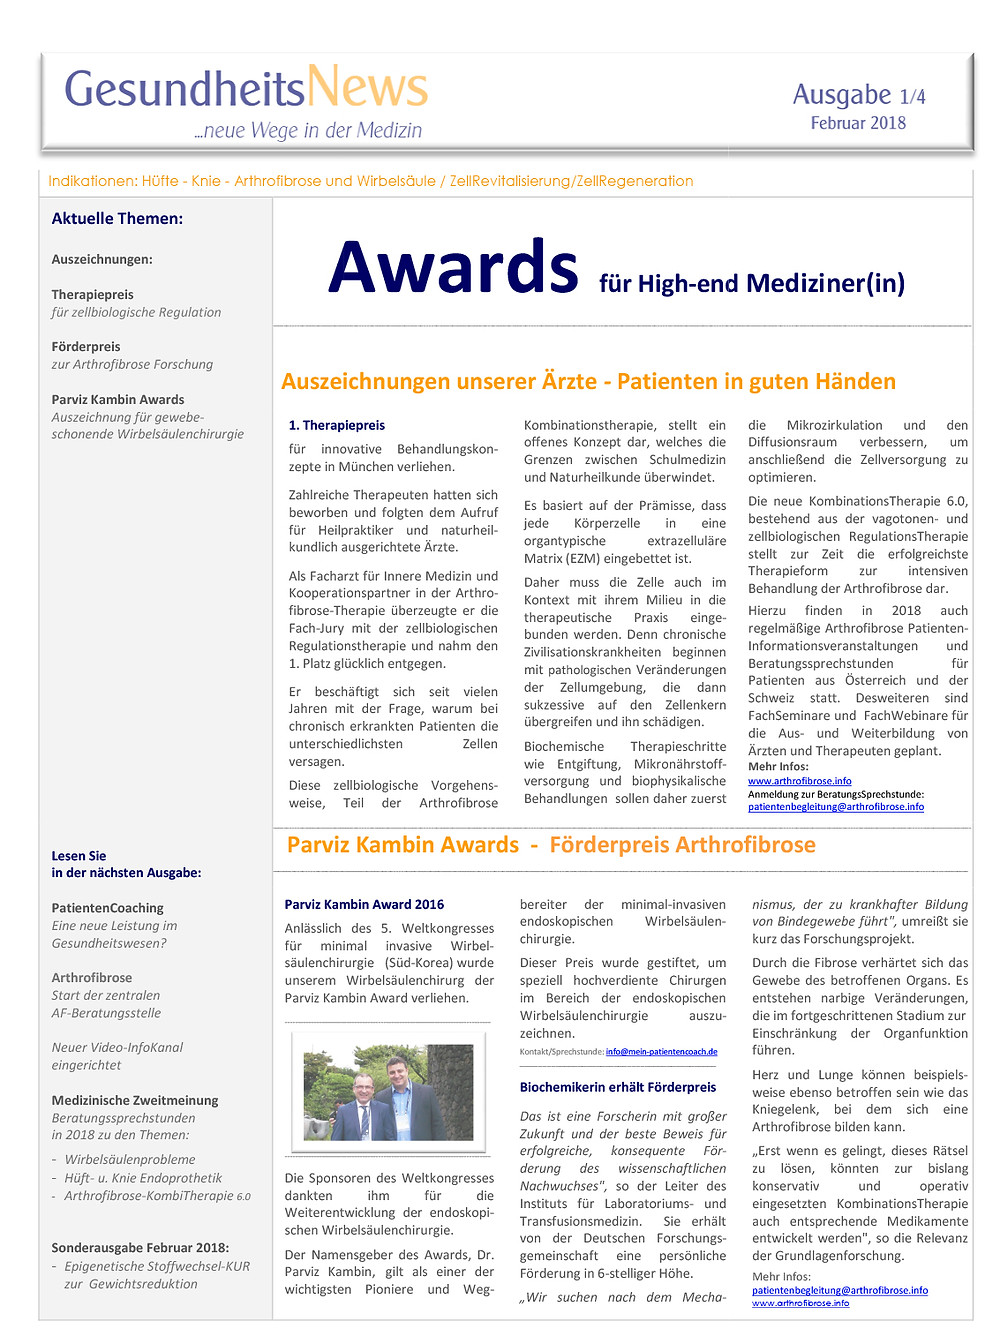 Förderpreis Arthrofibrose Parviz Kambin Awards